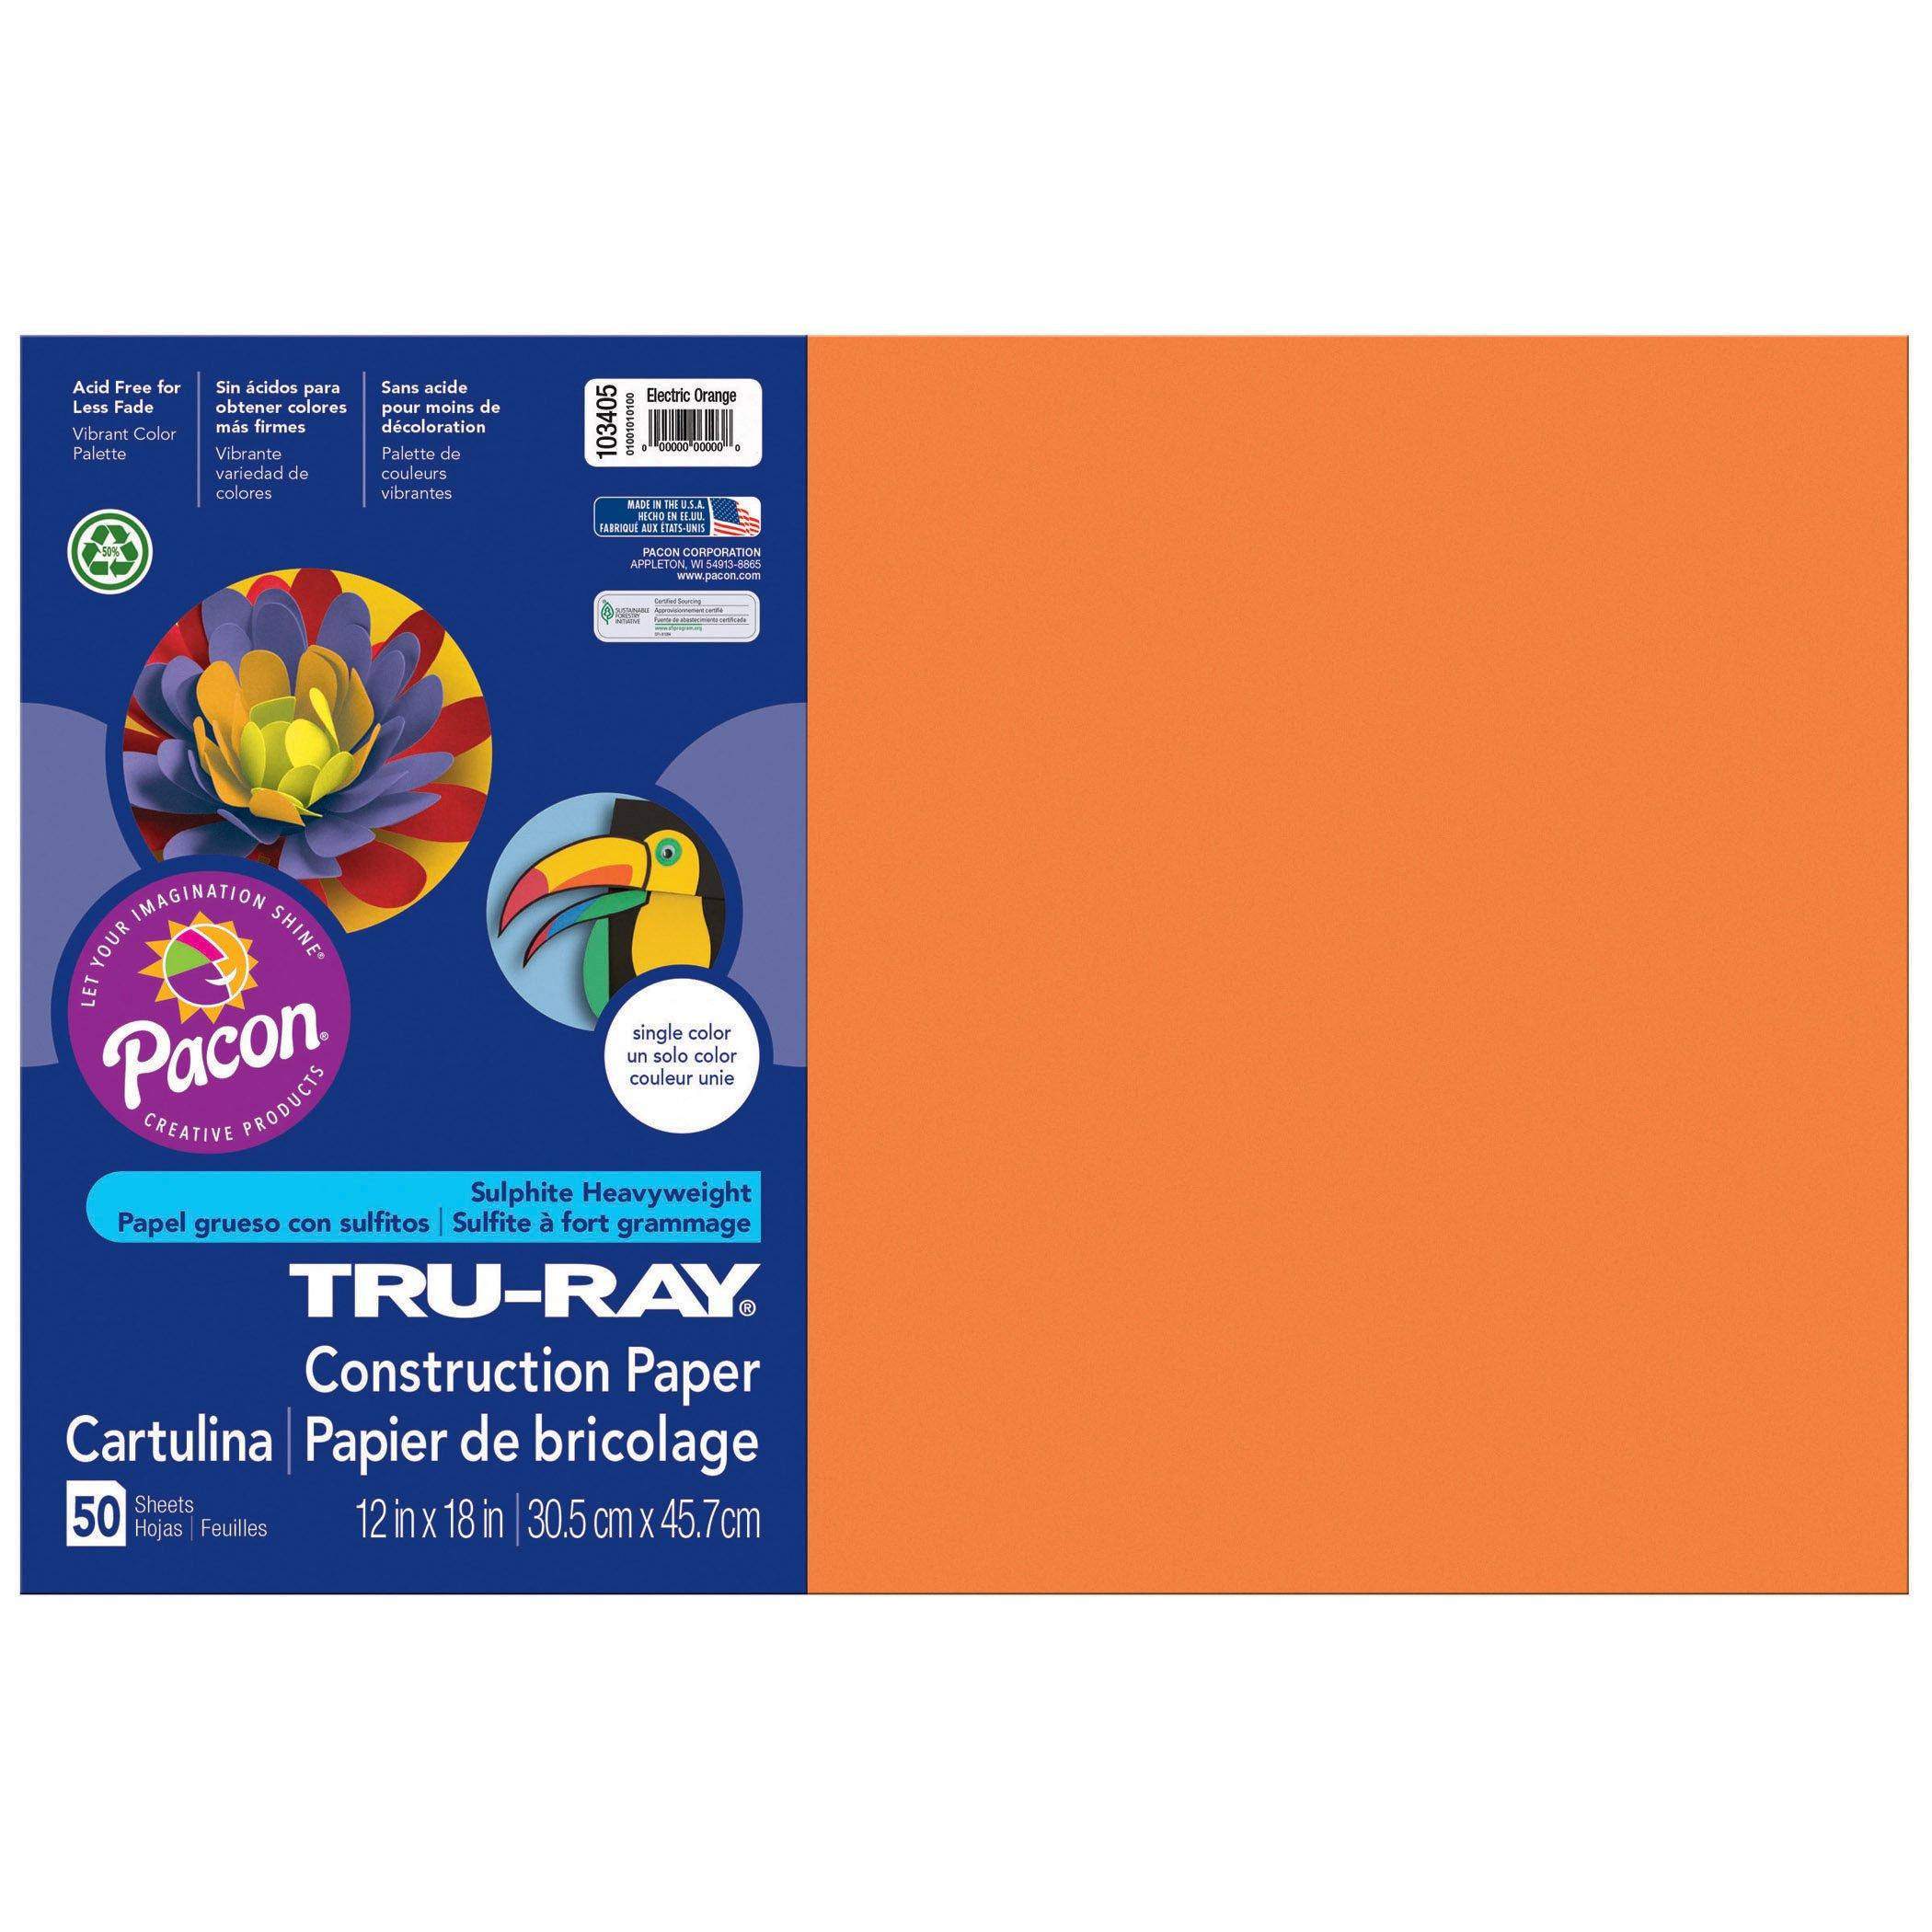 Tru-Ray PAC103405BN Construction Paper, Electric Orange, 12'' x 18'', 50 Sheets per Pack, 3 Packs